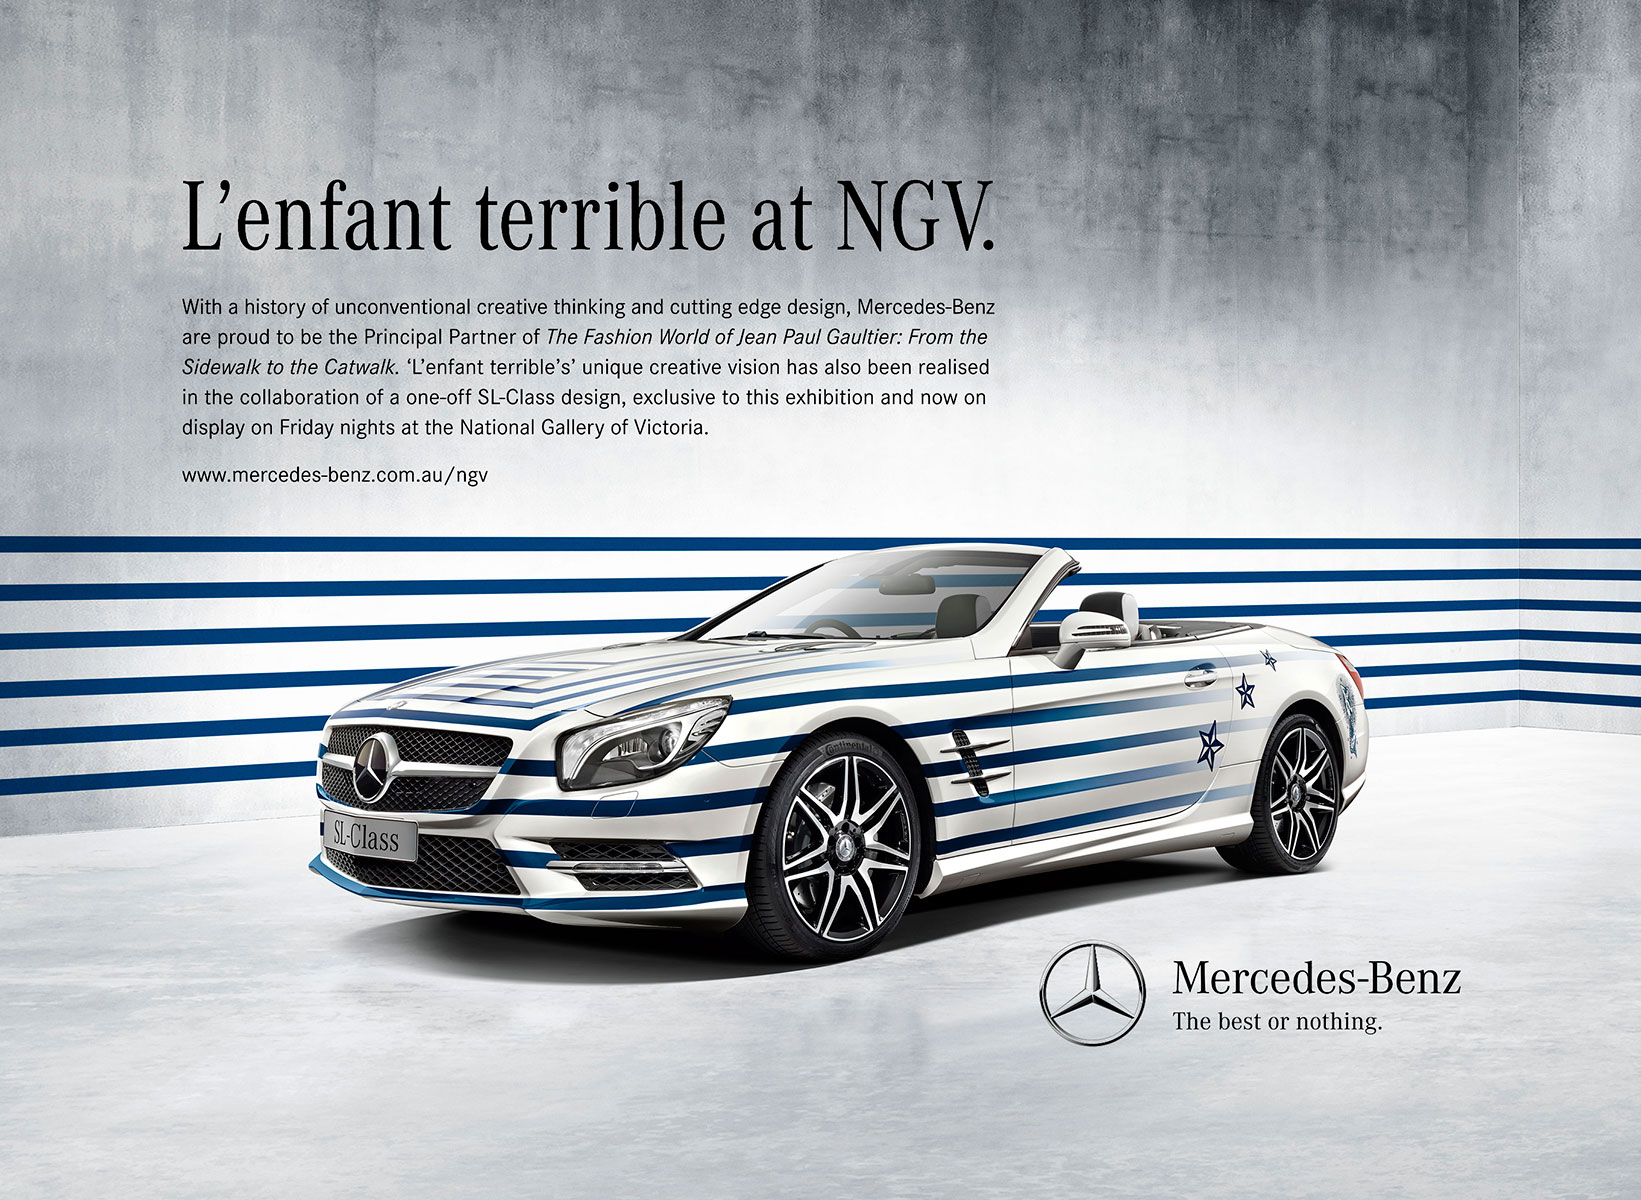 Mercedes_L'enfant terrible at NGV